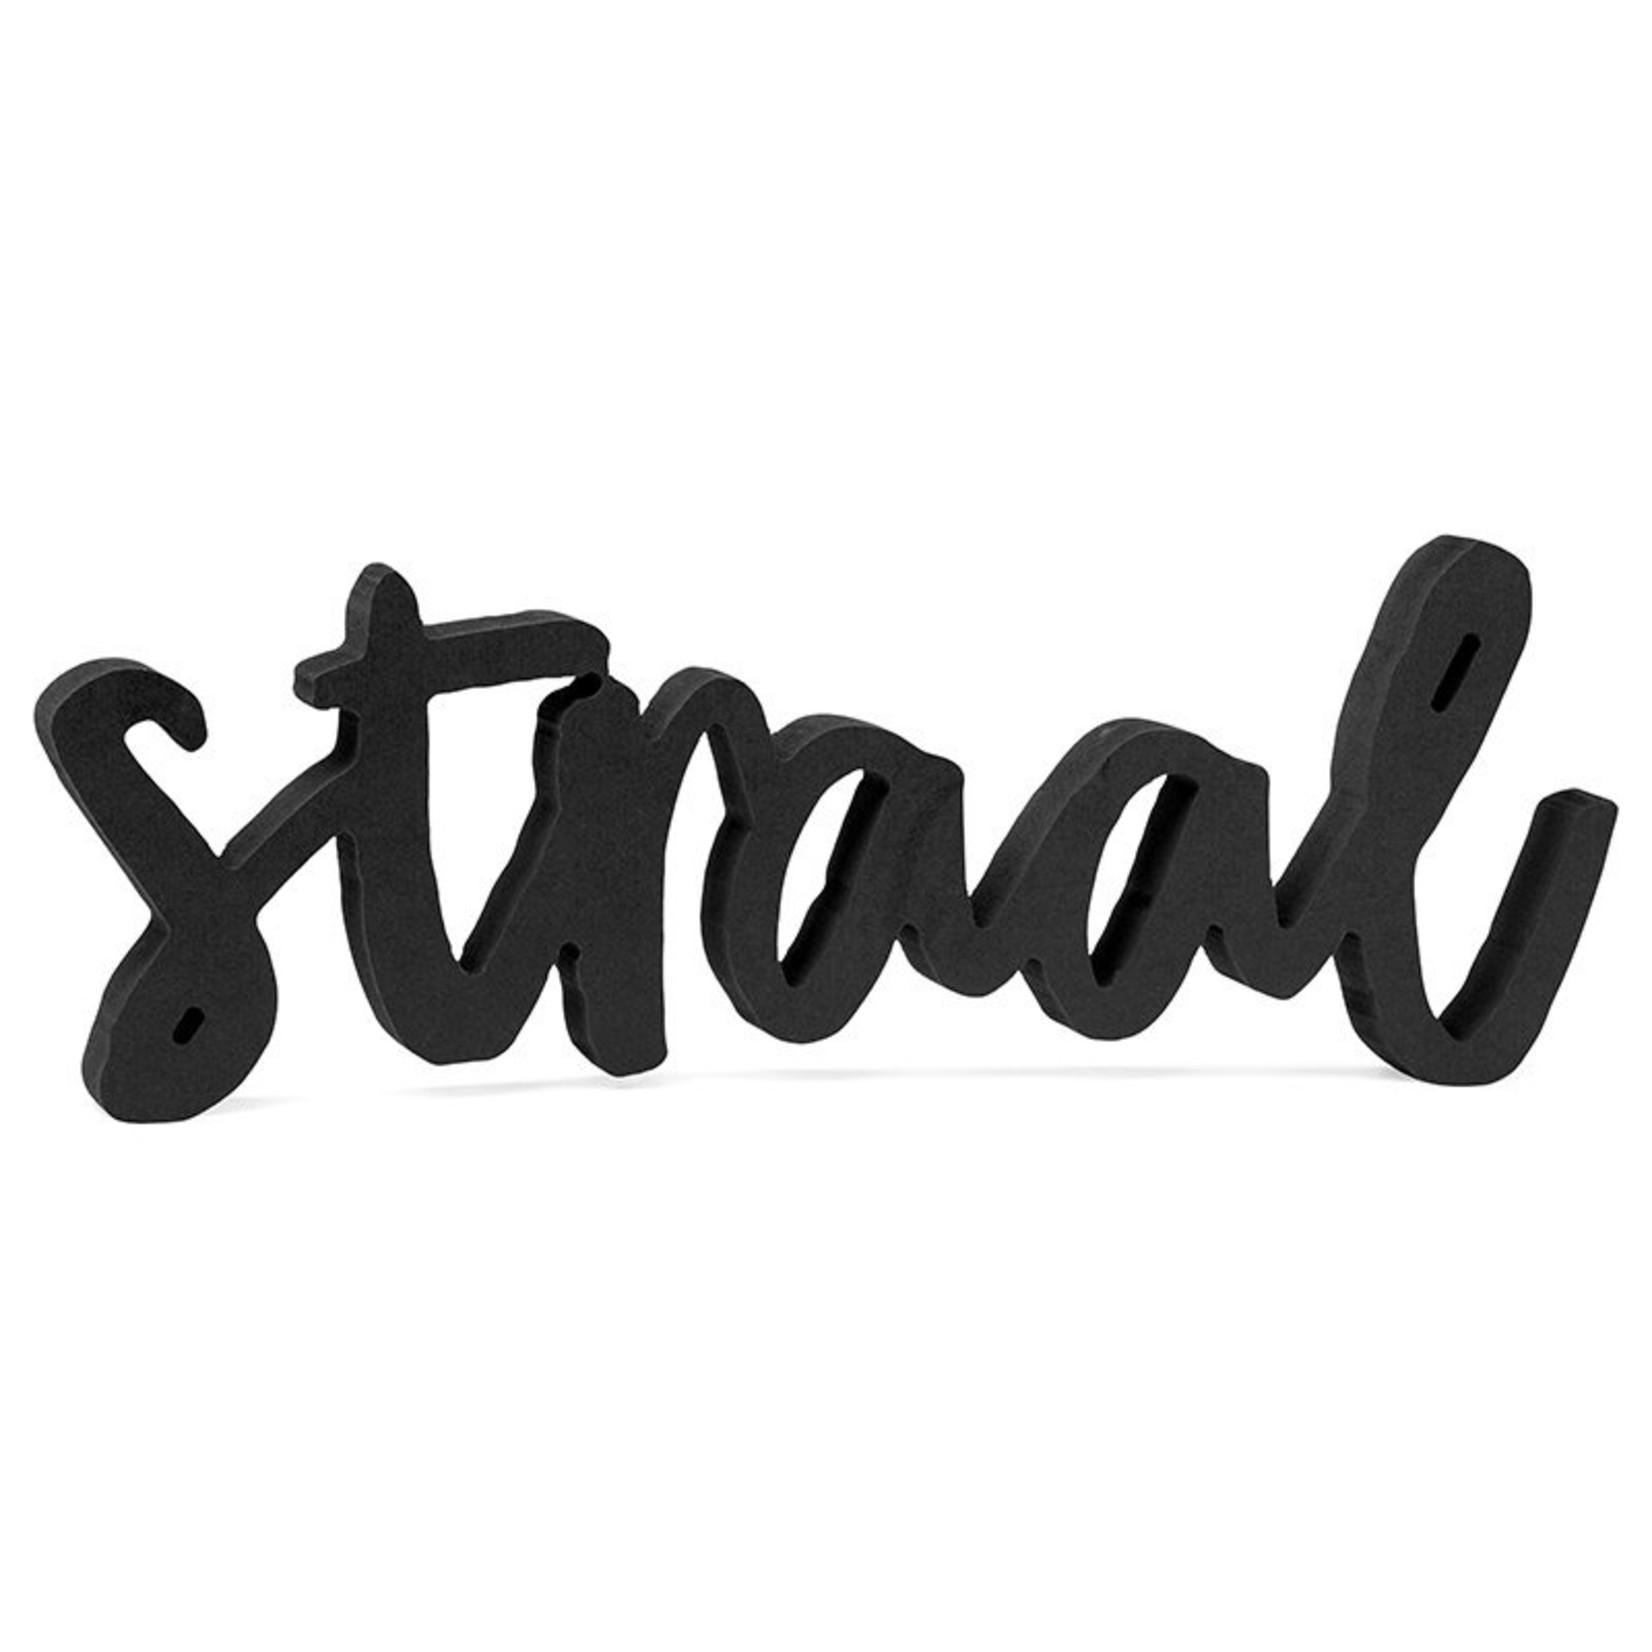 "Zoedt Woord ""Straal"" - Hout - Zwart"